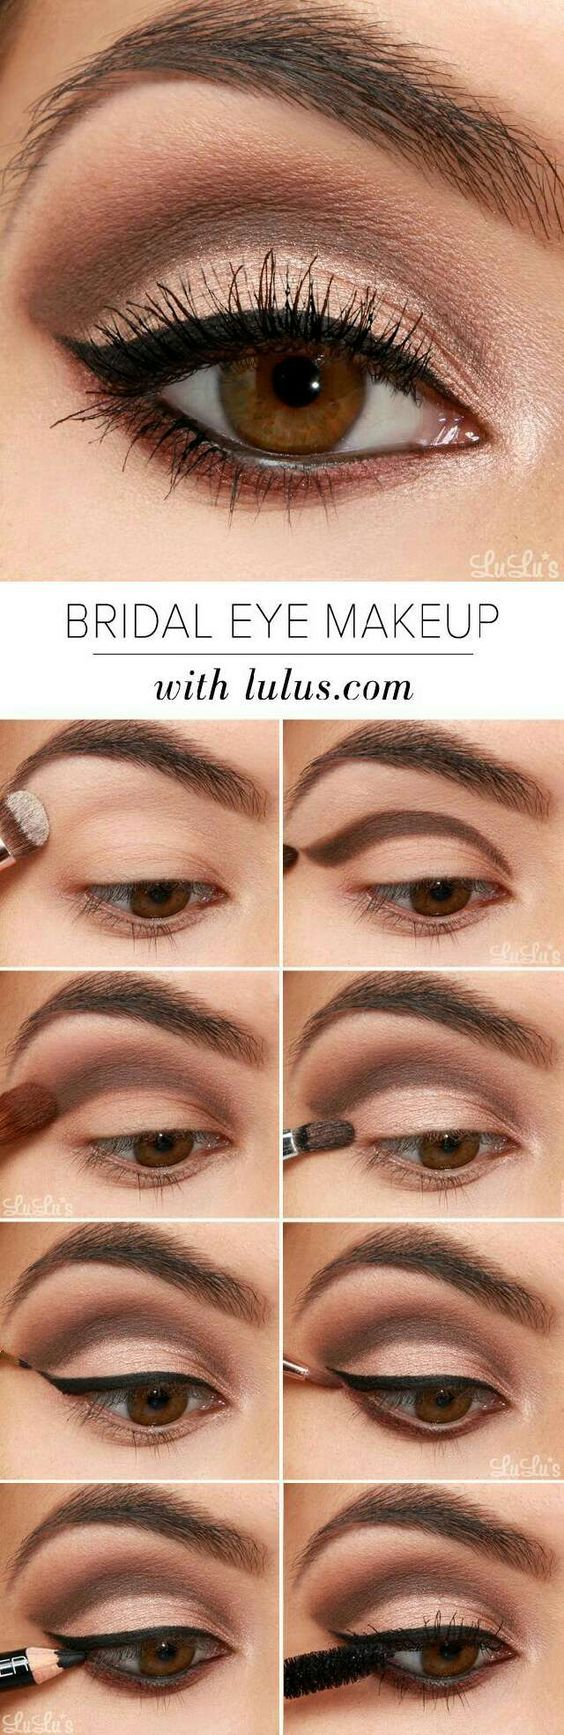 17 Super Basic Eye Makeup Ideas For Beginners 2018 Make Up